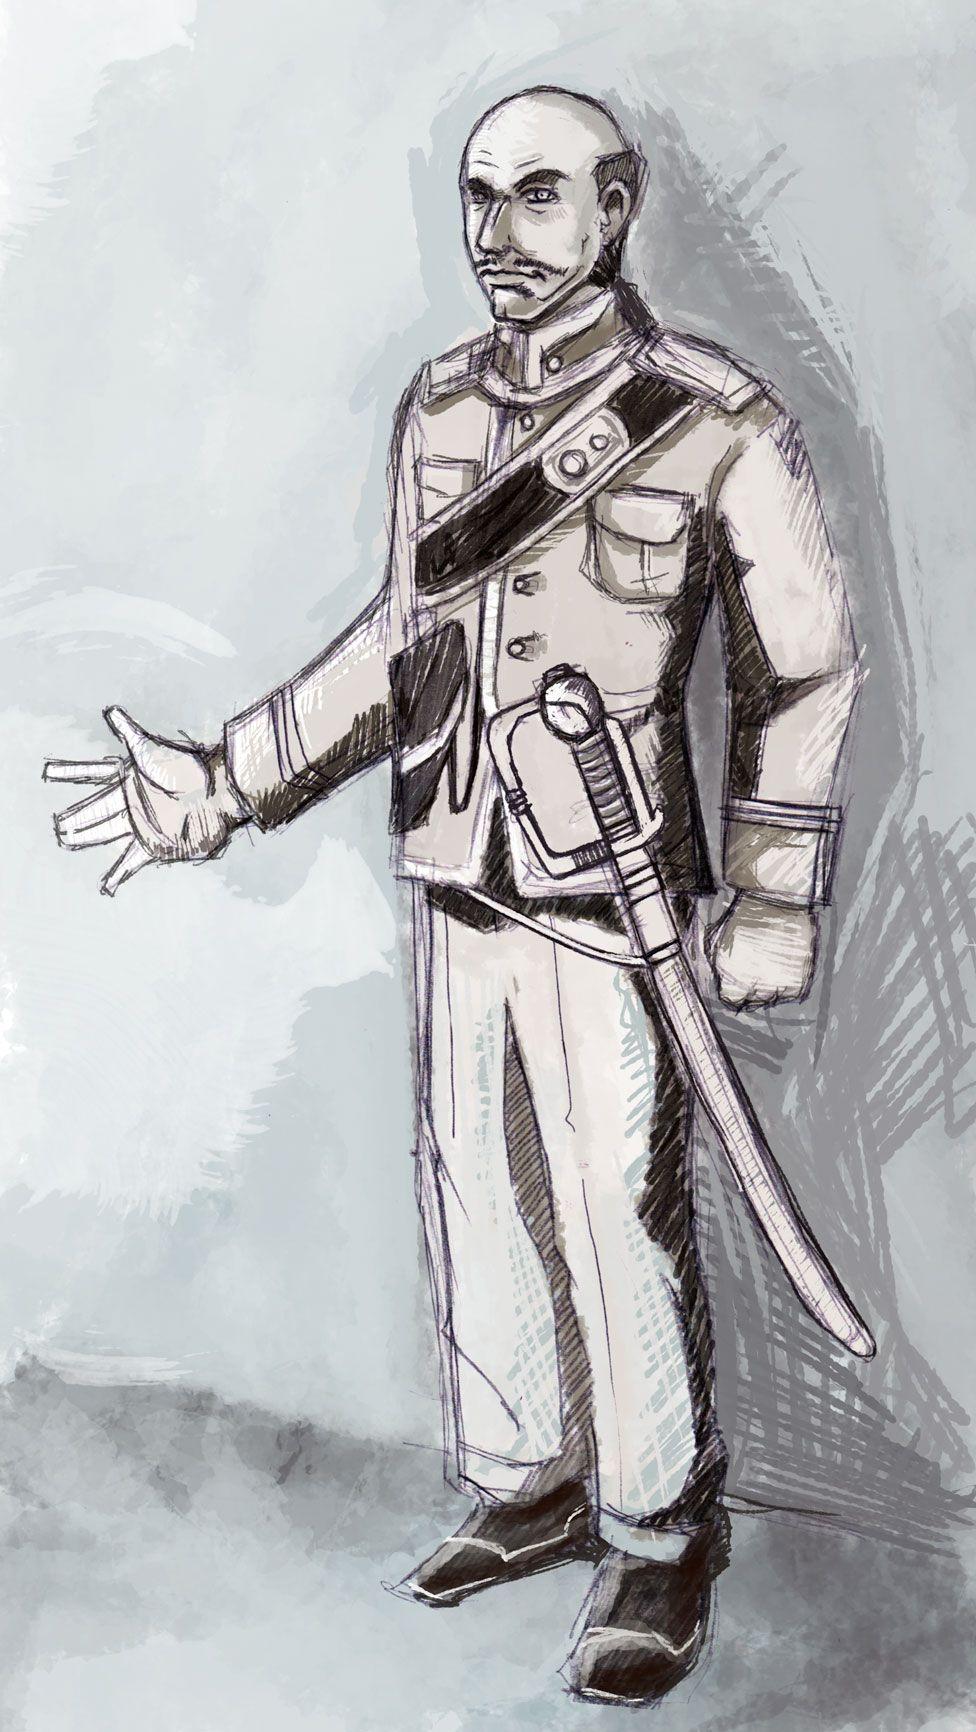 character design for Rizal's Noli Me Tangere | e-book art ...